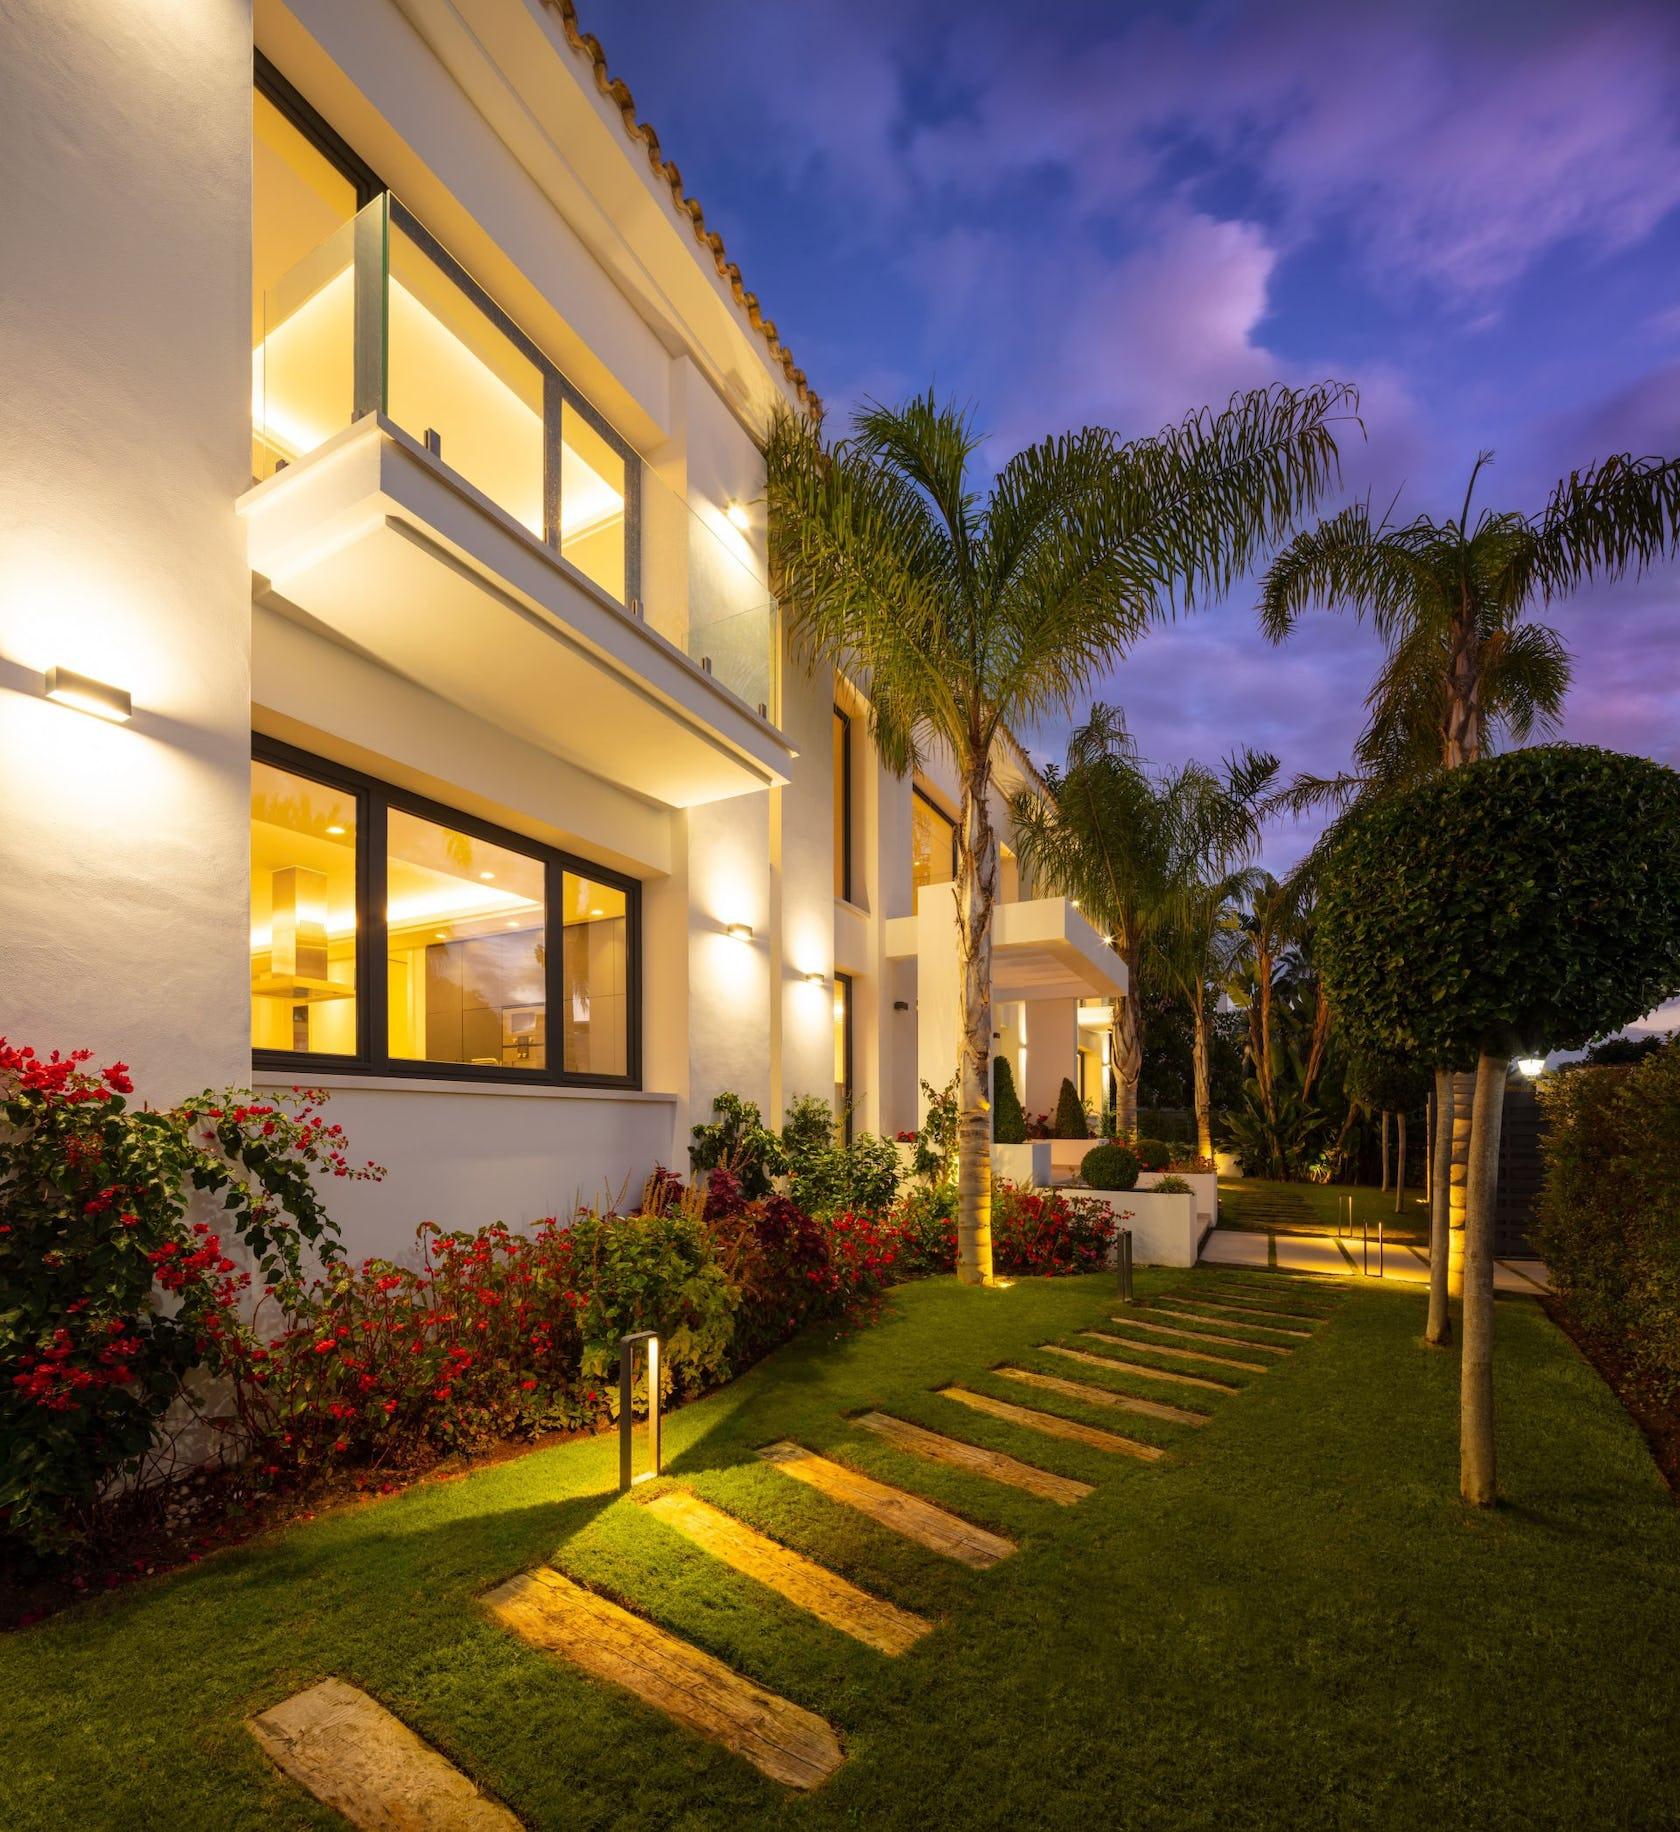 building housing hotel villa house outdoors